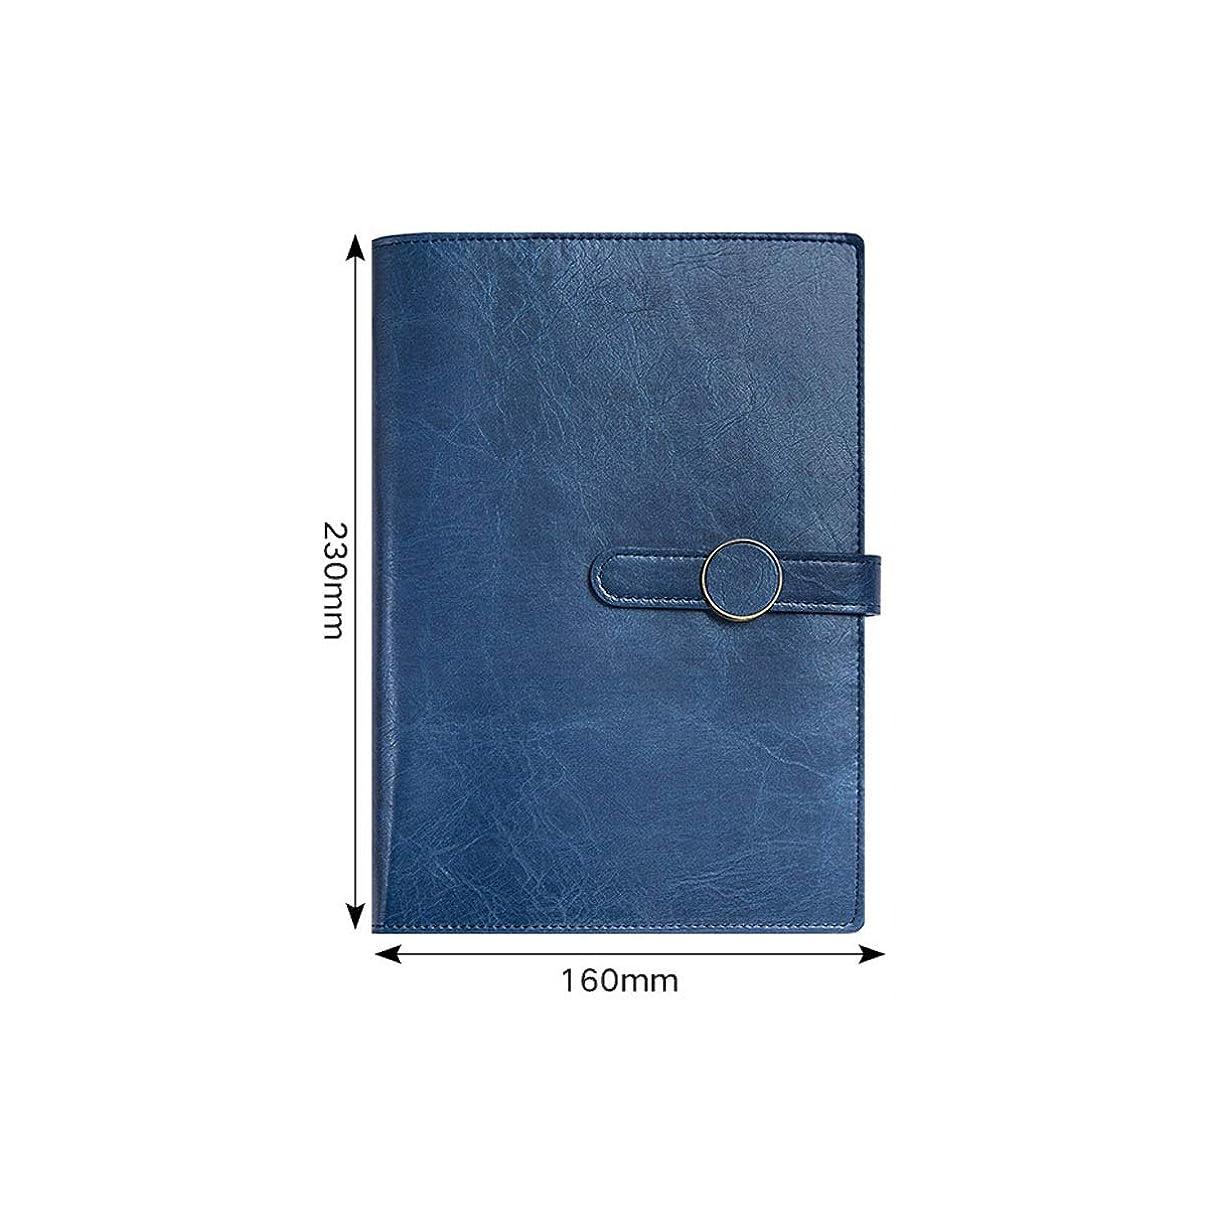 Kehuitong ルーズリーフノート、簡単な携帯用メモ帳、ビジネスオフィスの会議のノート、赤、茶色、緑、青、黒 高品質の製品 1 (Color : Blue)